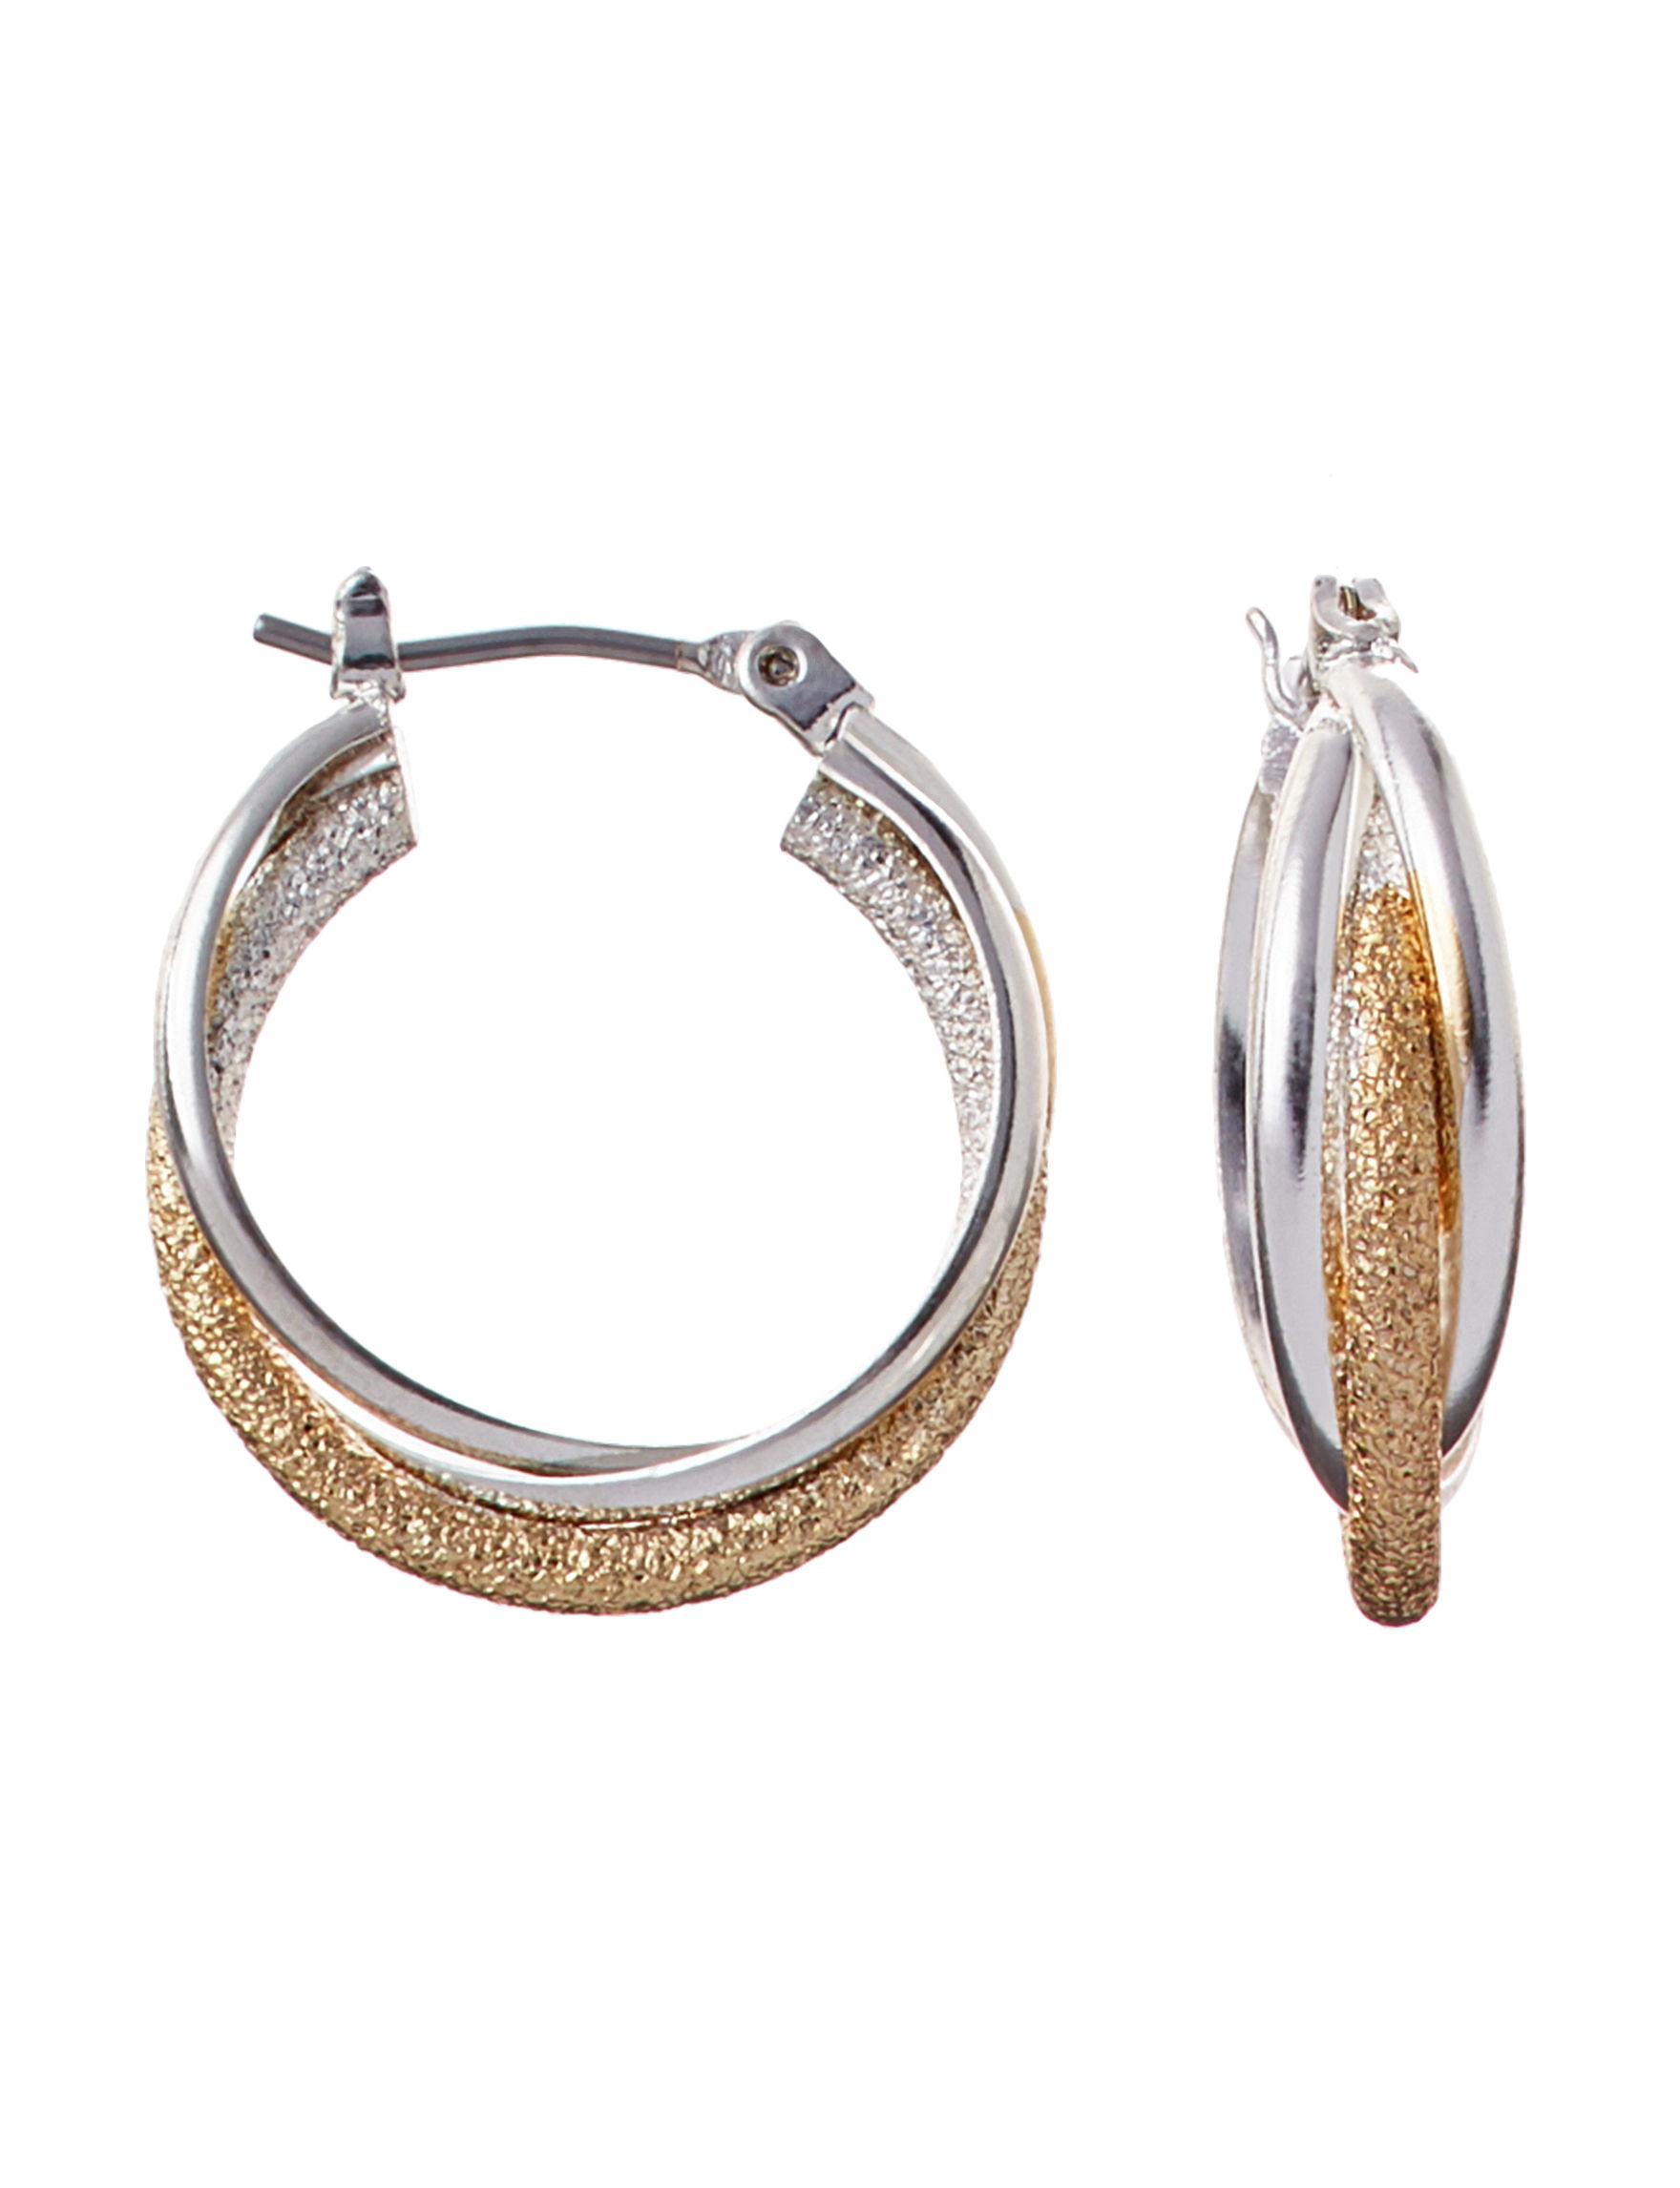 Hannah Two Tone Hoops Earrings Fashion Jewelry